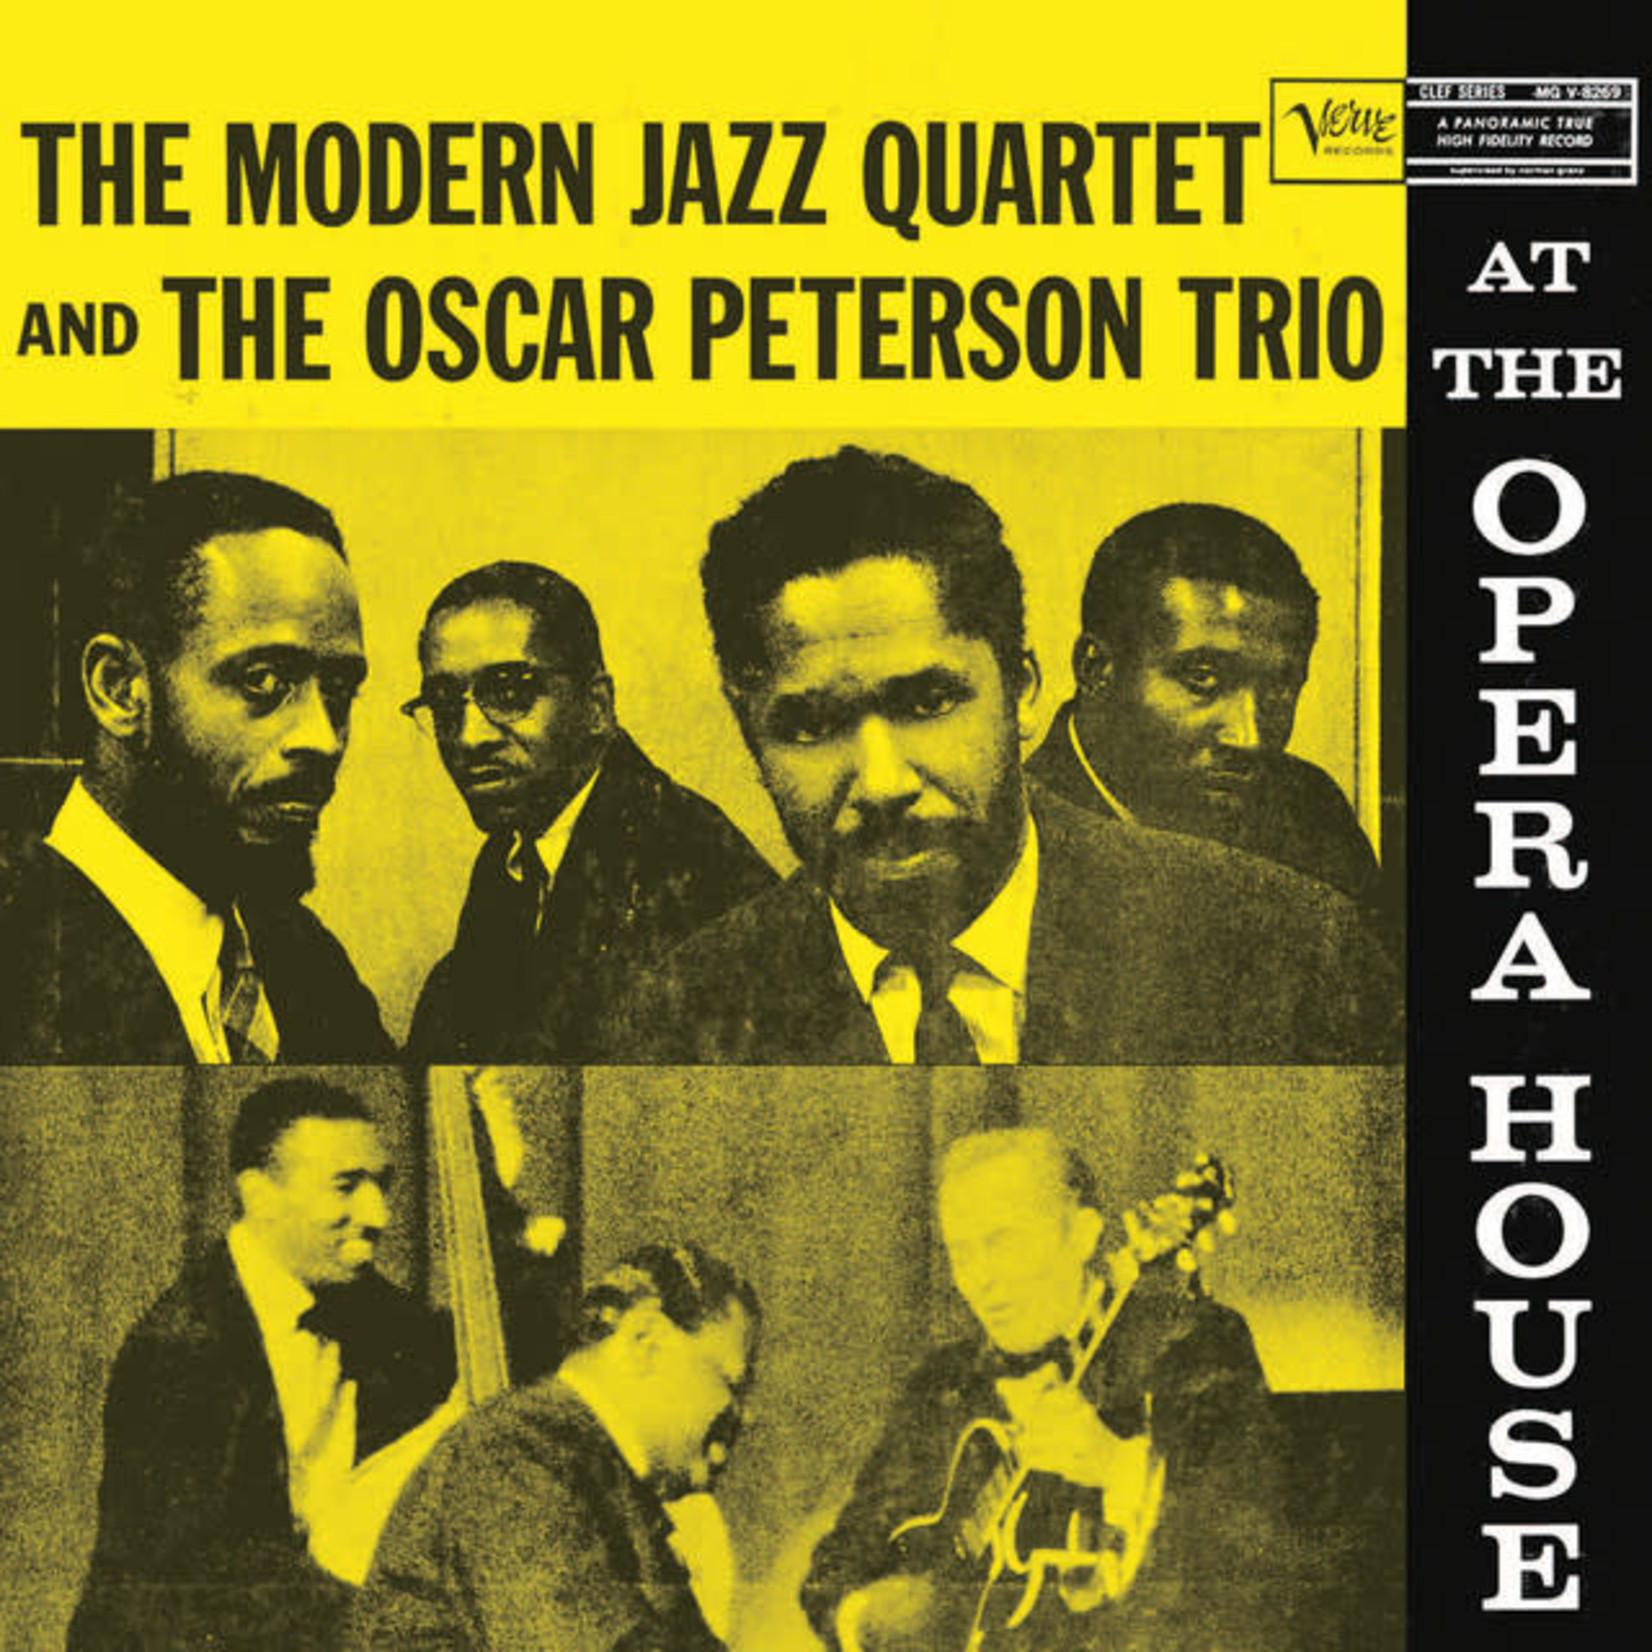 Vinyl Oscar Peterson Trio - The Modern Jazz Quartet and The Oscar Peterson Trio